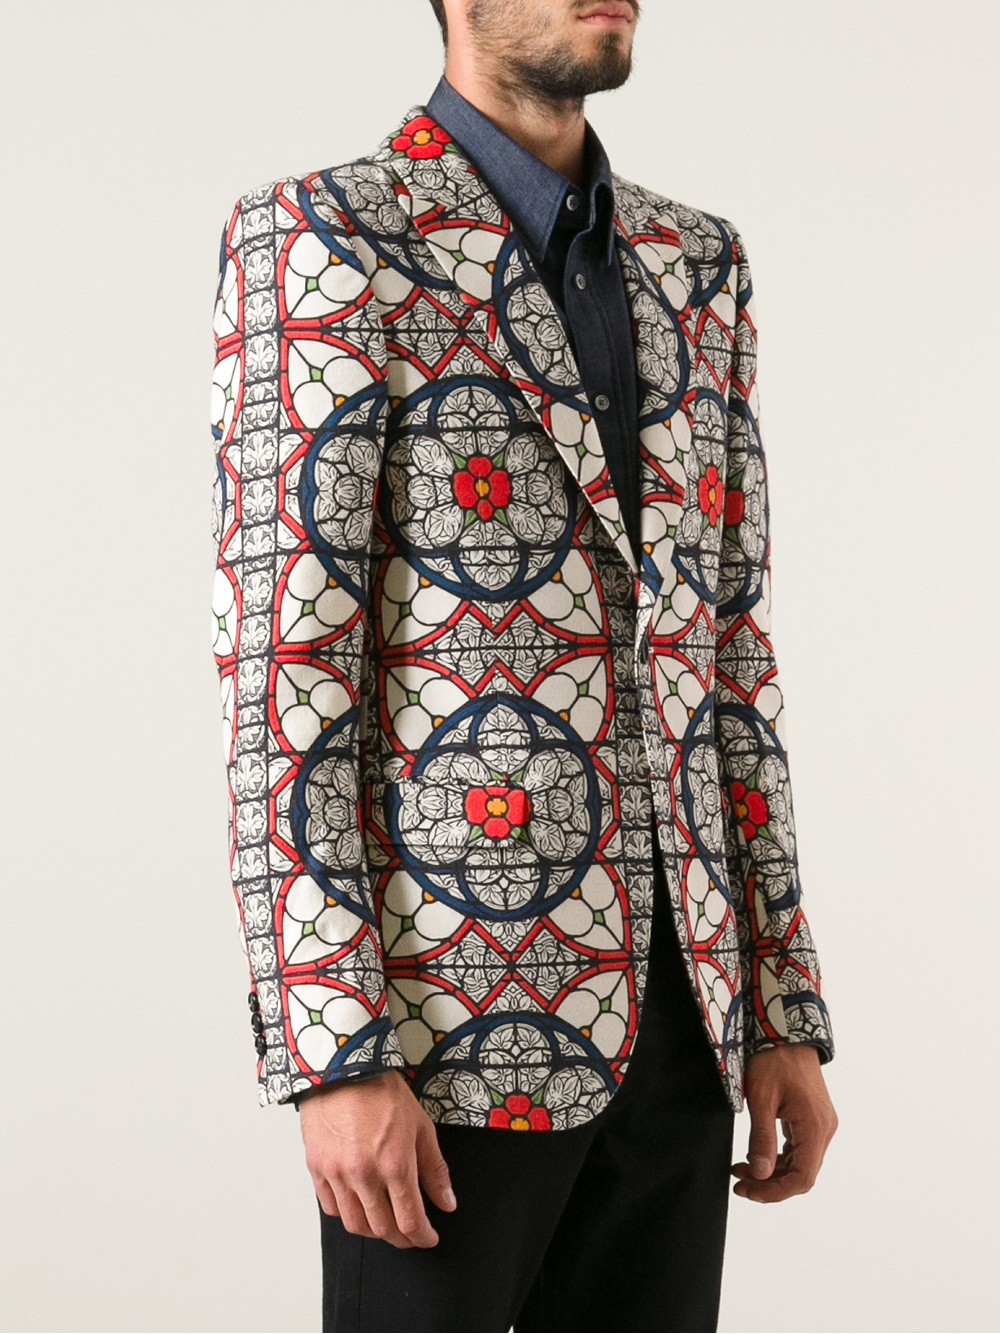 Alexander mcqueen Patterned Blazer for Men | Lyst